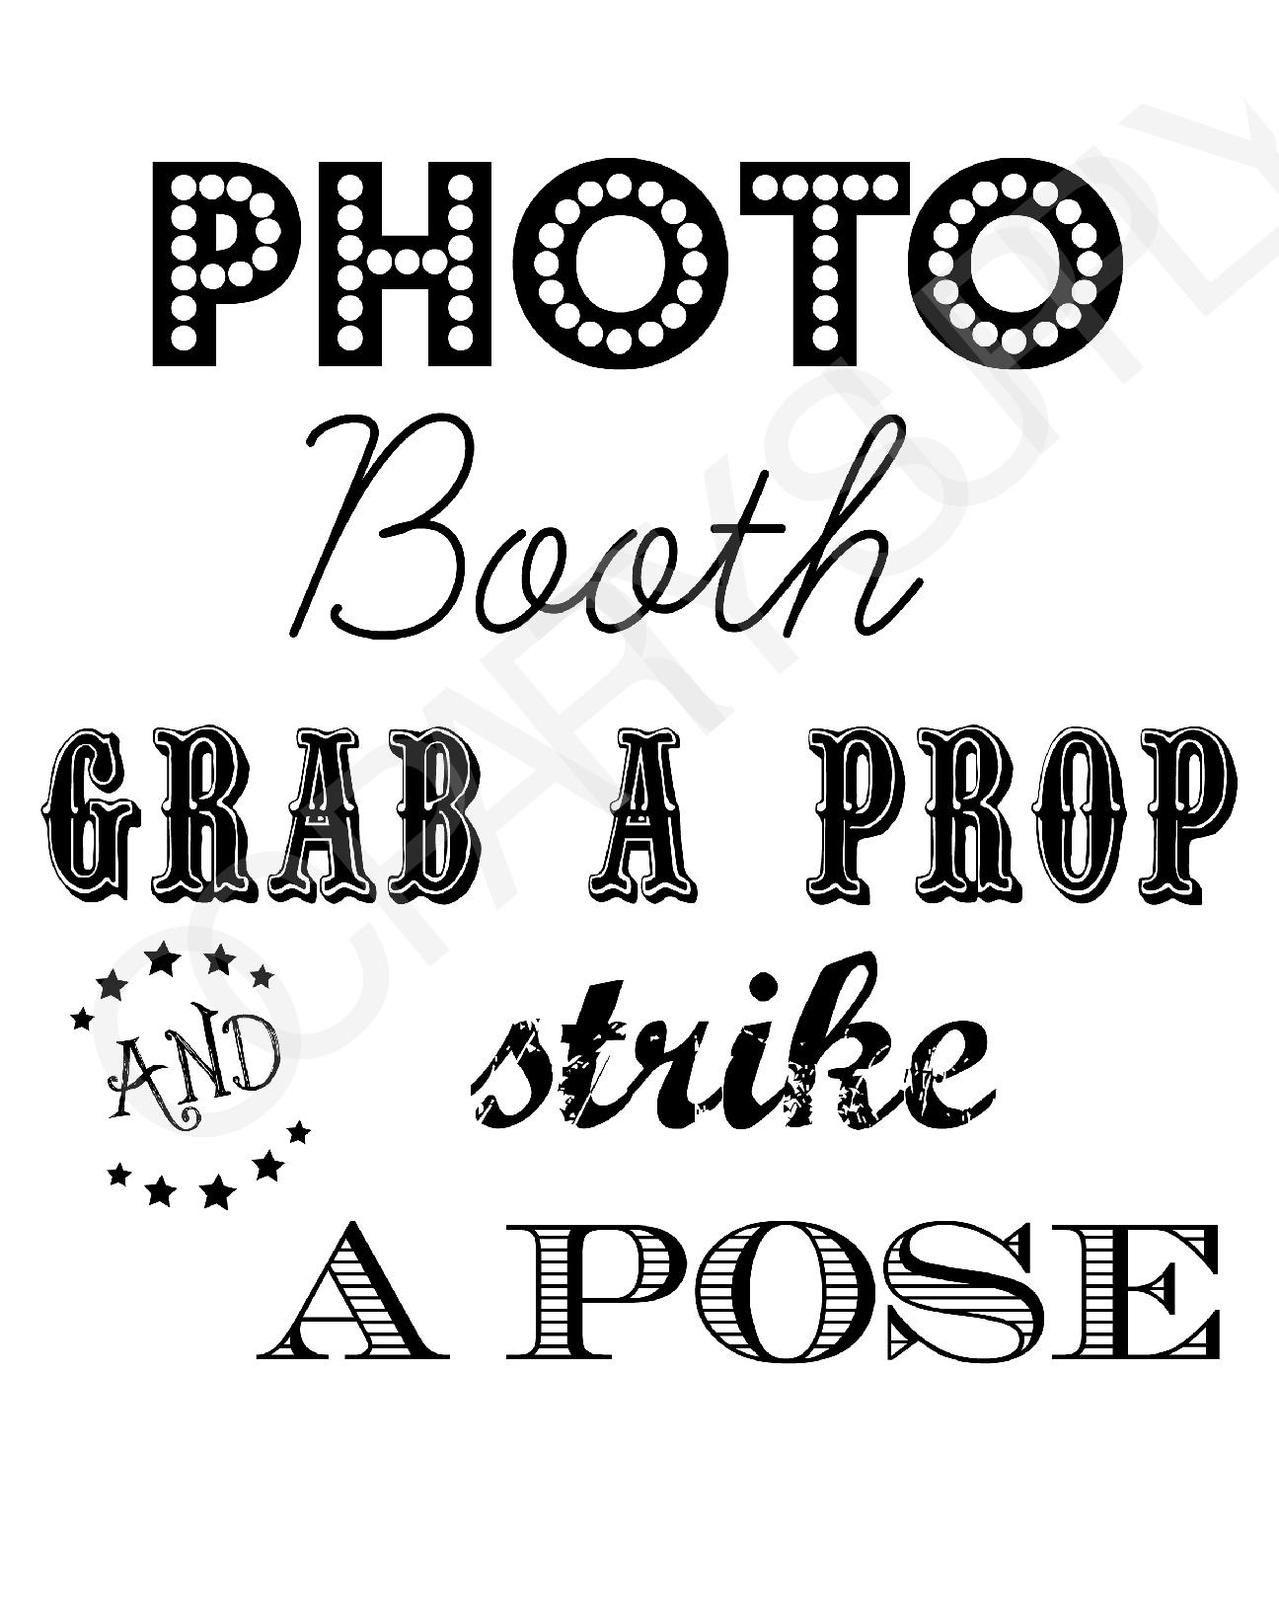 Free Photo Booth Sign (Printable)   Party Planning   Fiesta En La - Selfie Station Free Printable